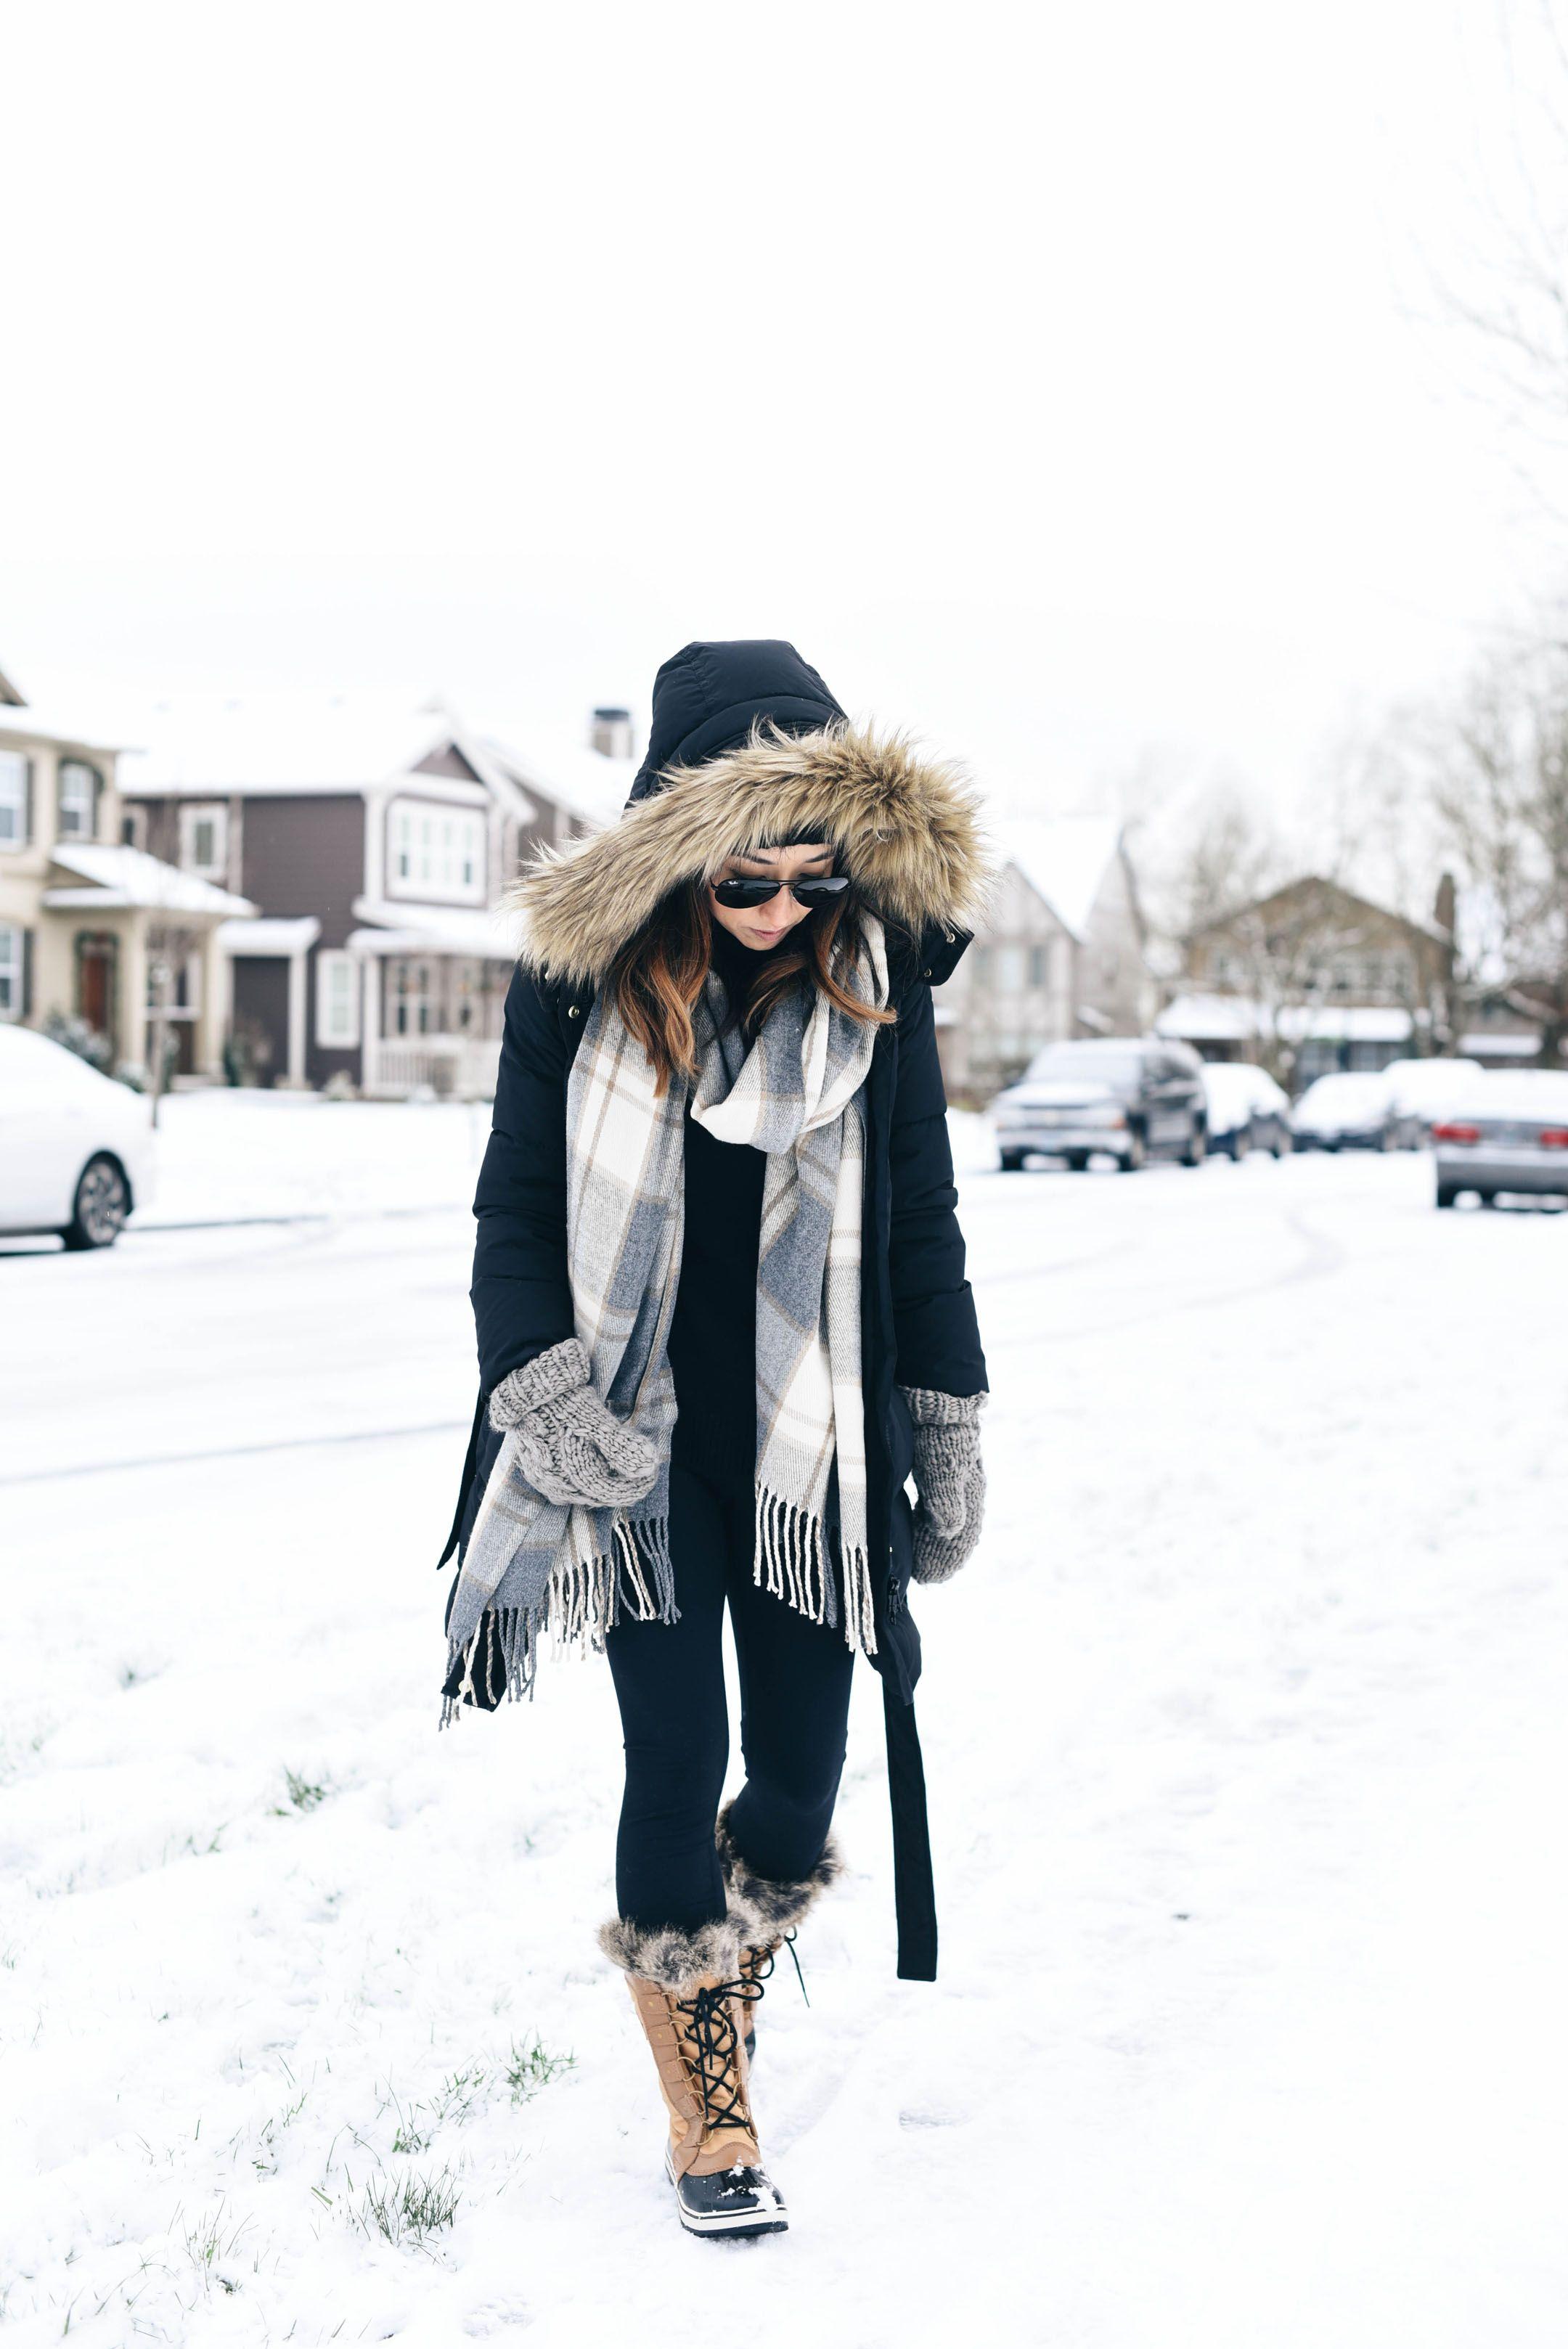 5adb33f76 Our First Snow Day | Fashion Bloggers | Winter fashion, Winter ...